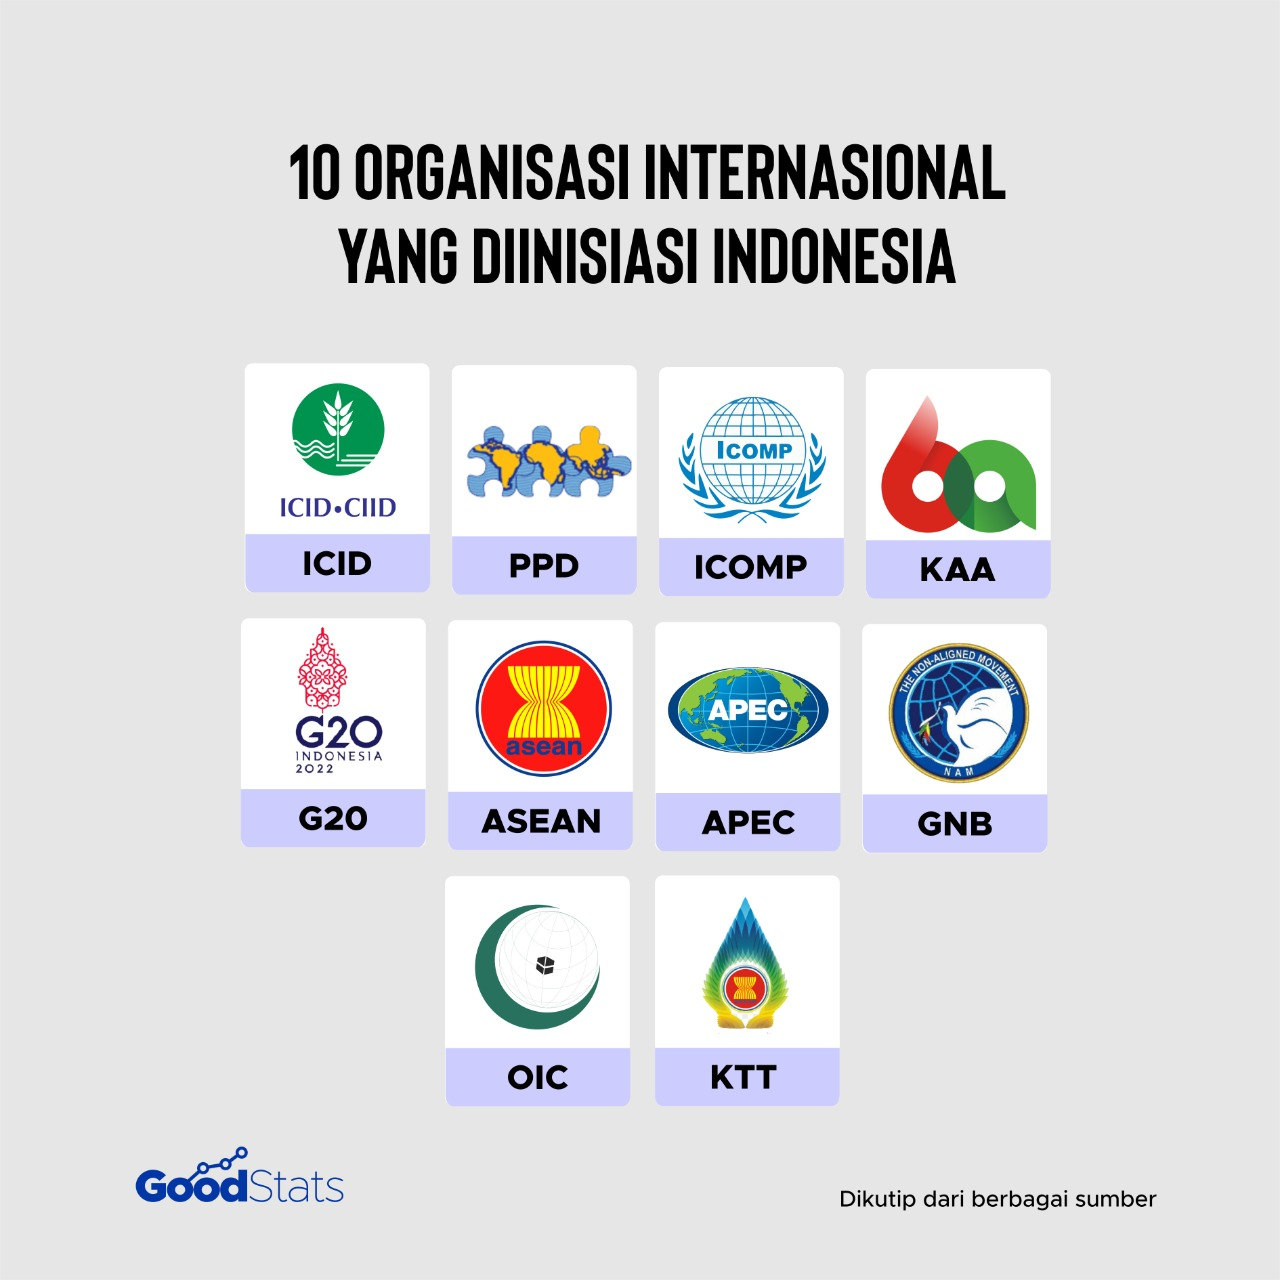 GoodStats mencatat 10 organisasi internasional di mana Indonesia menjadi salah satu pendirinya. | Infografis : GoodStats